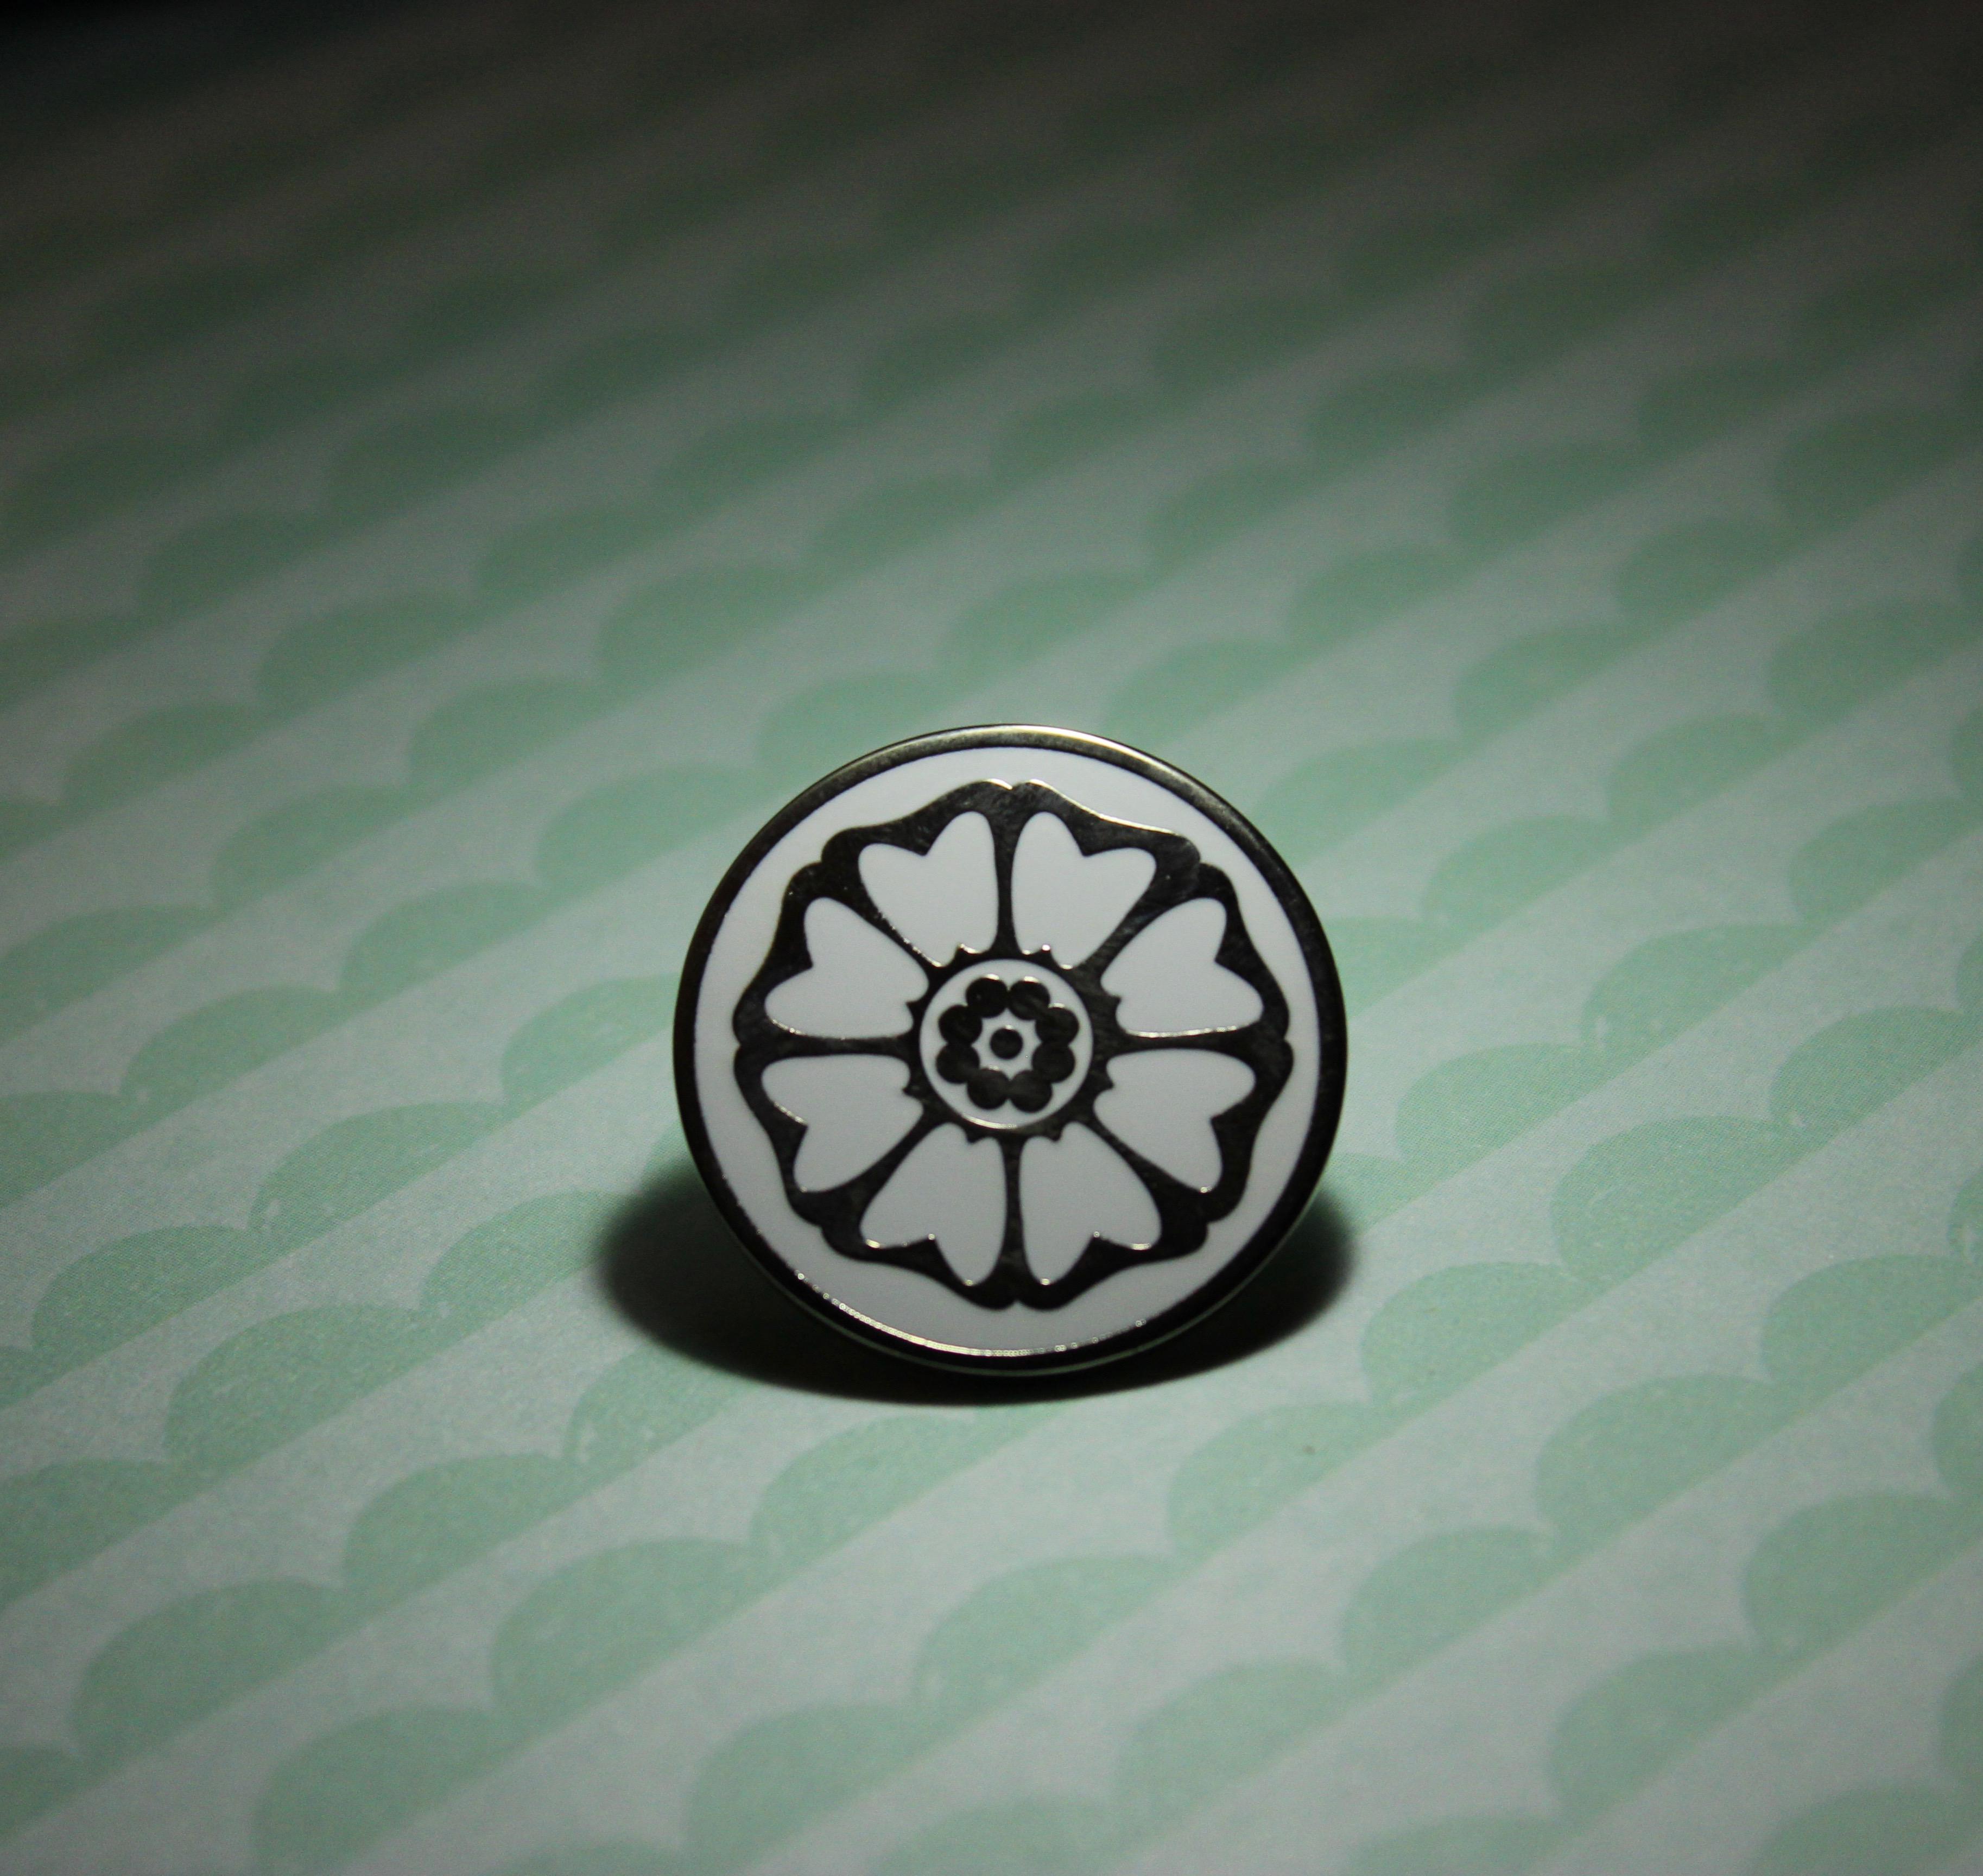 Avatar The Last Airbender White Lotus Tile Lapel Pin On Storenvy